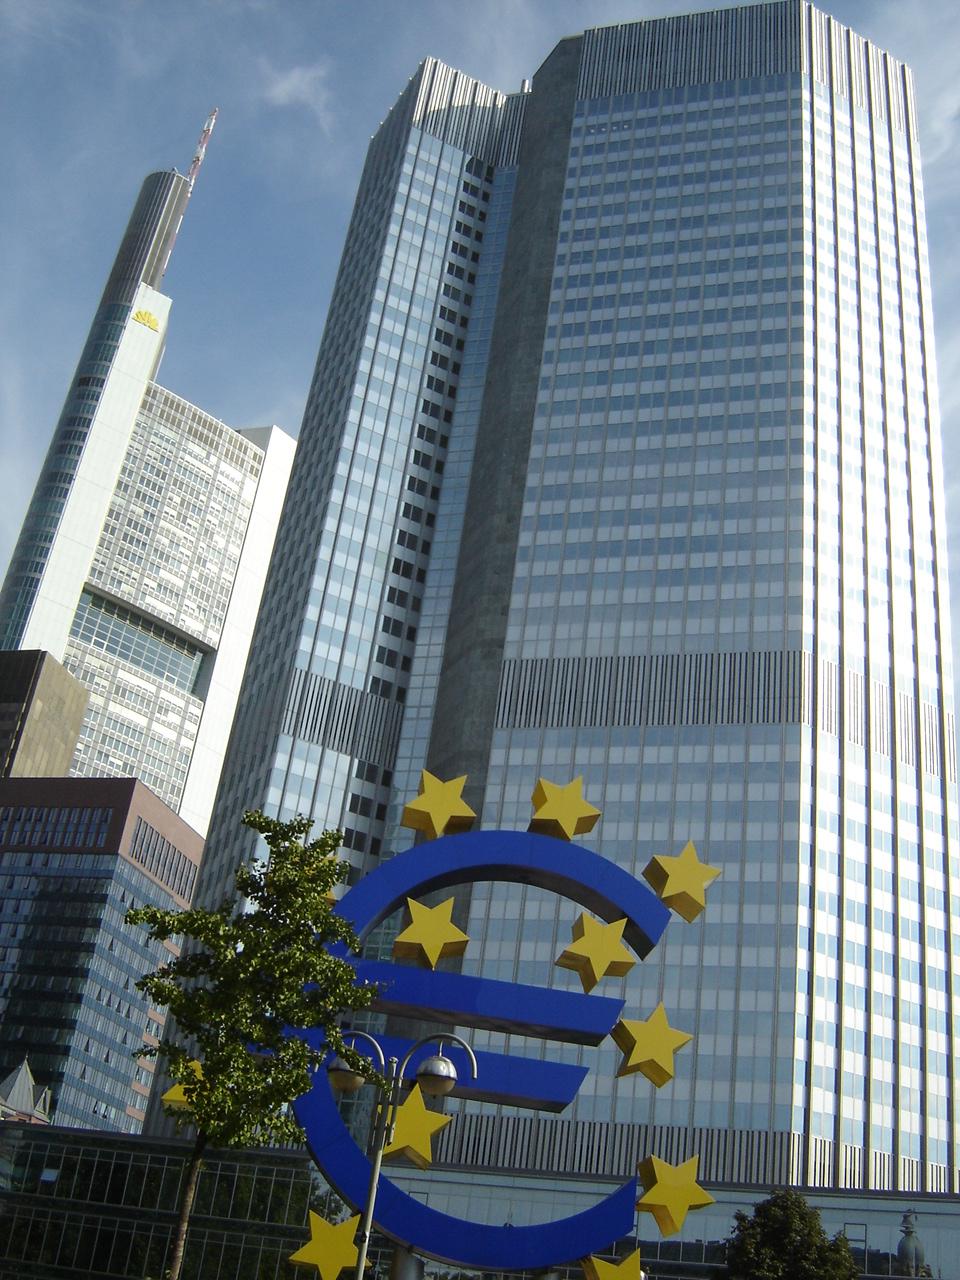 The European Central Bank building in Frankfurt